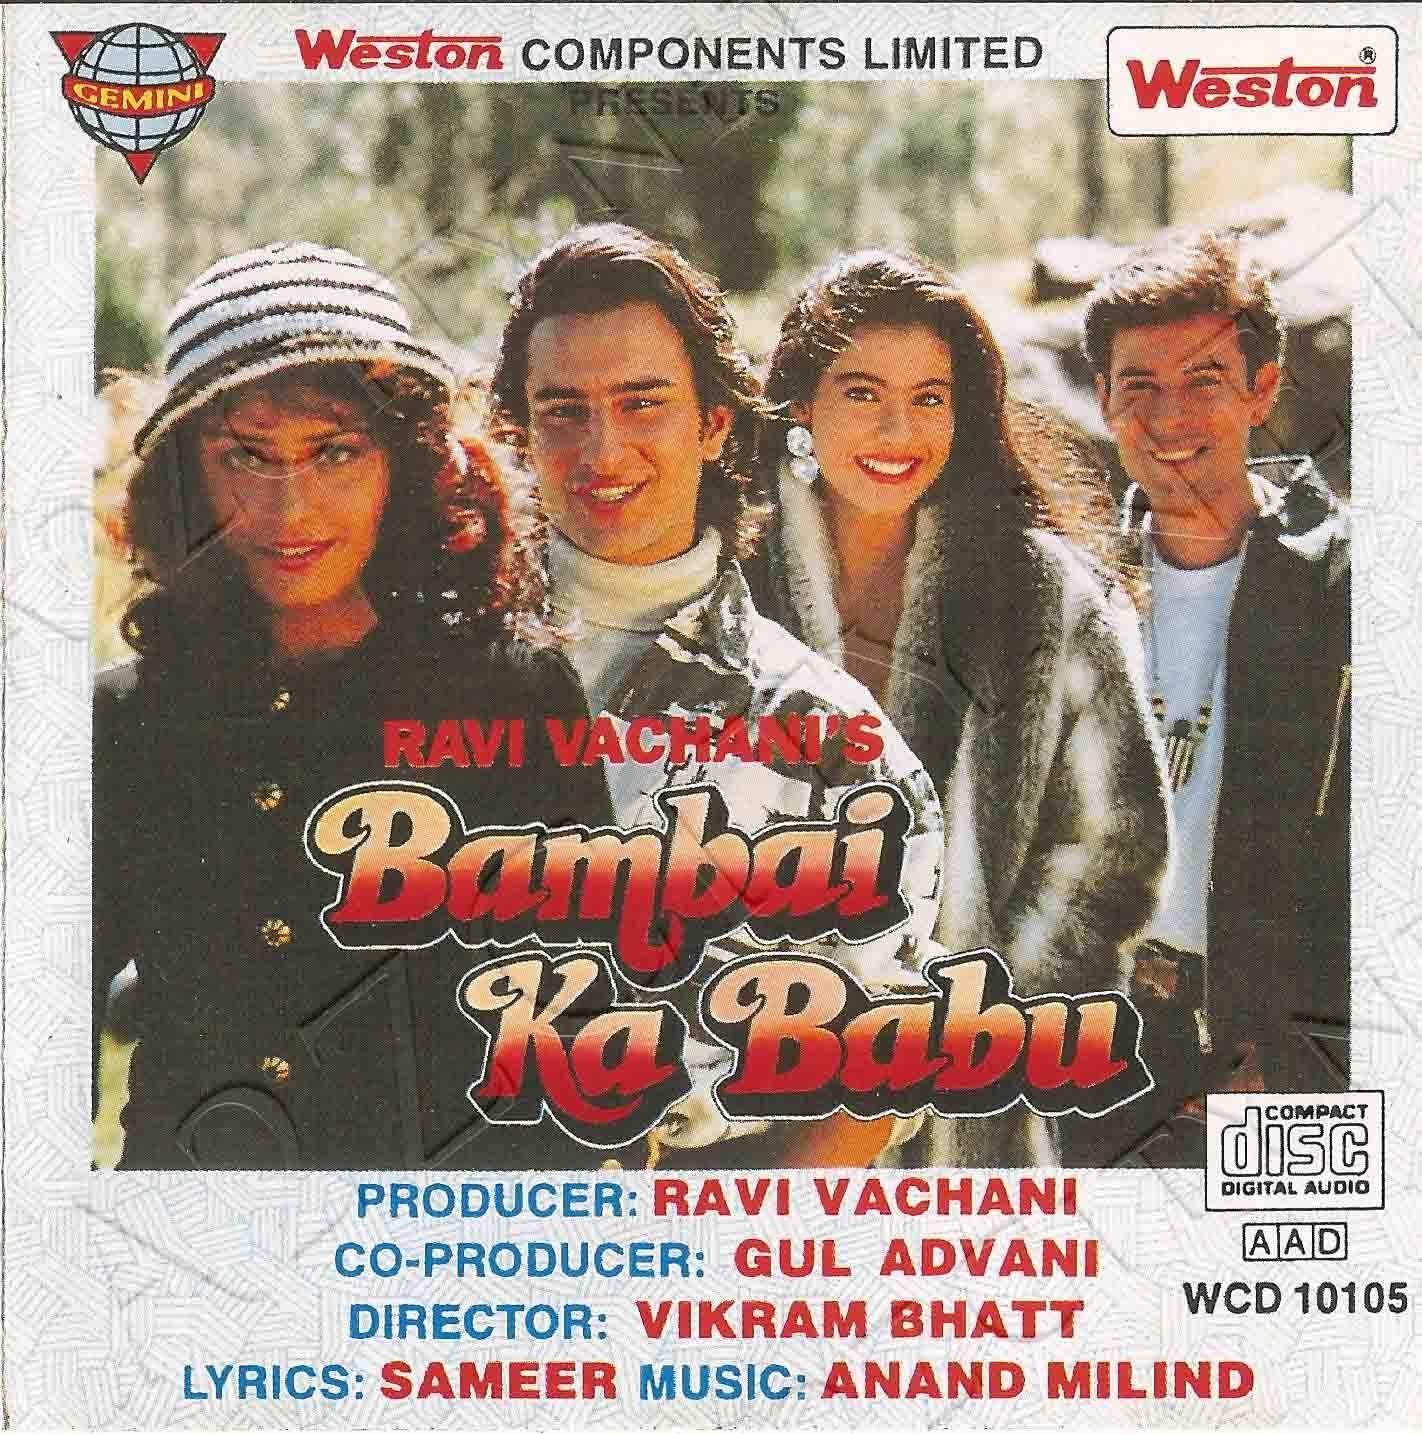 bambai ka babu 1996 mp3 songs free download